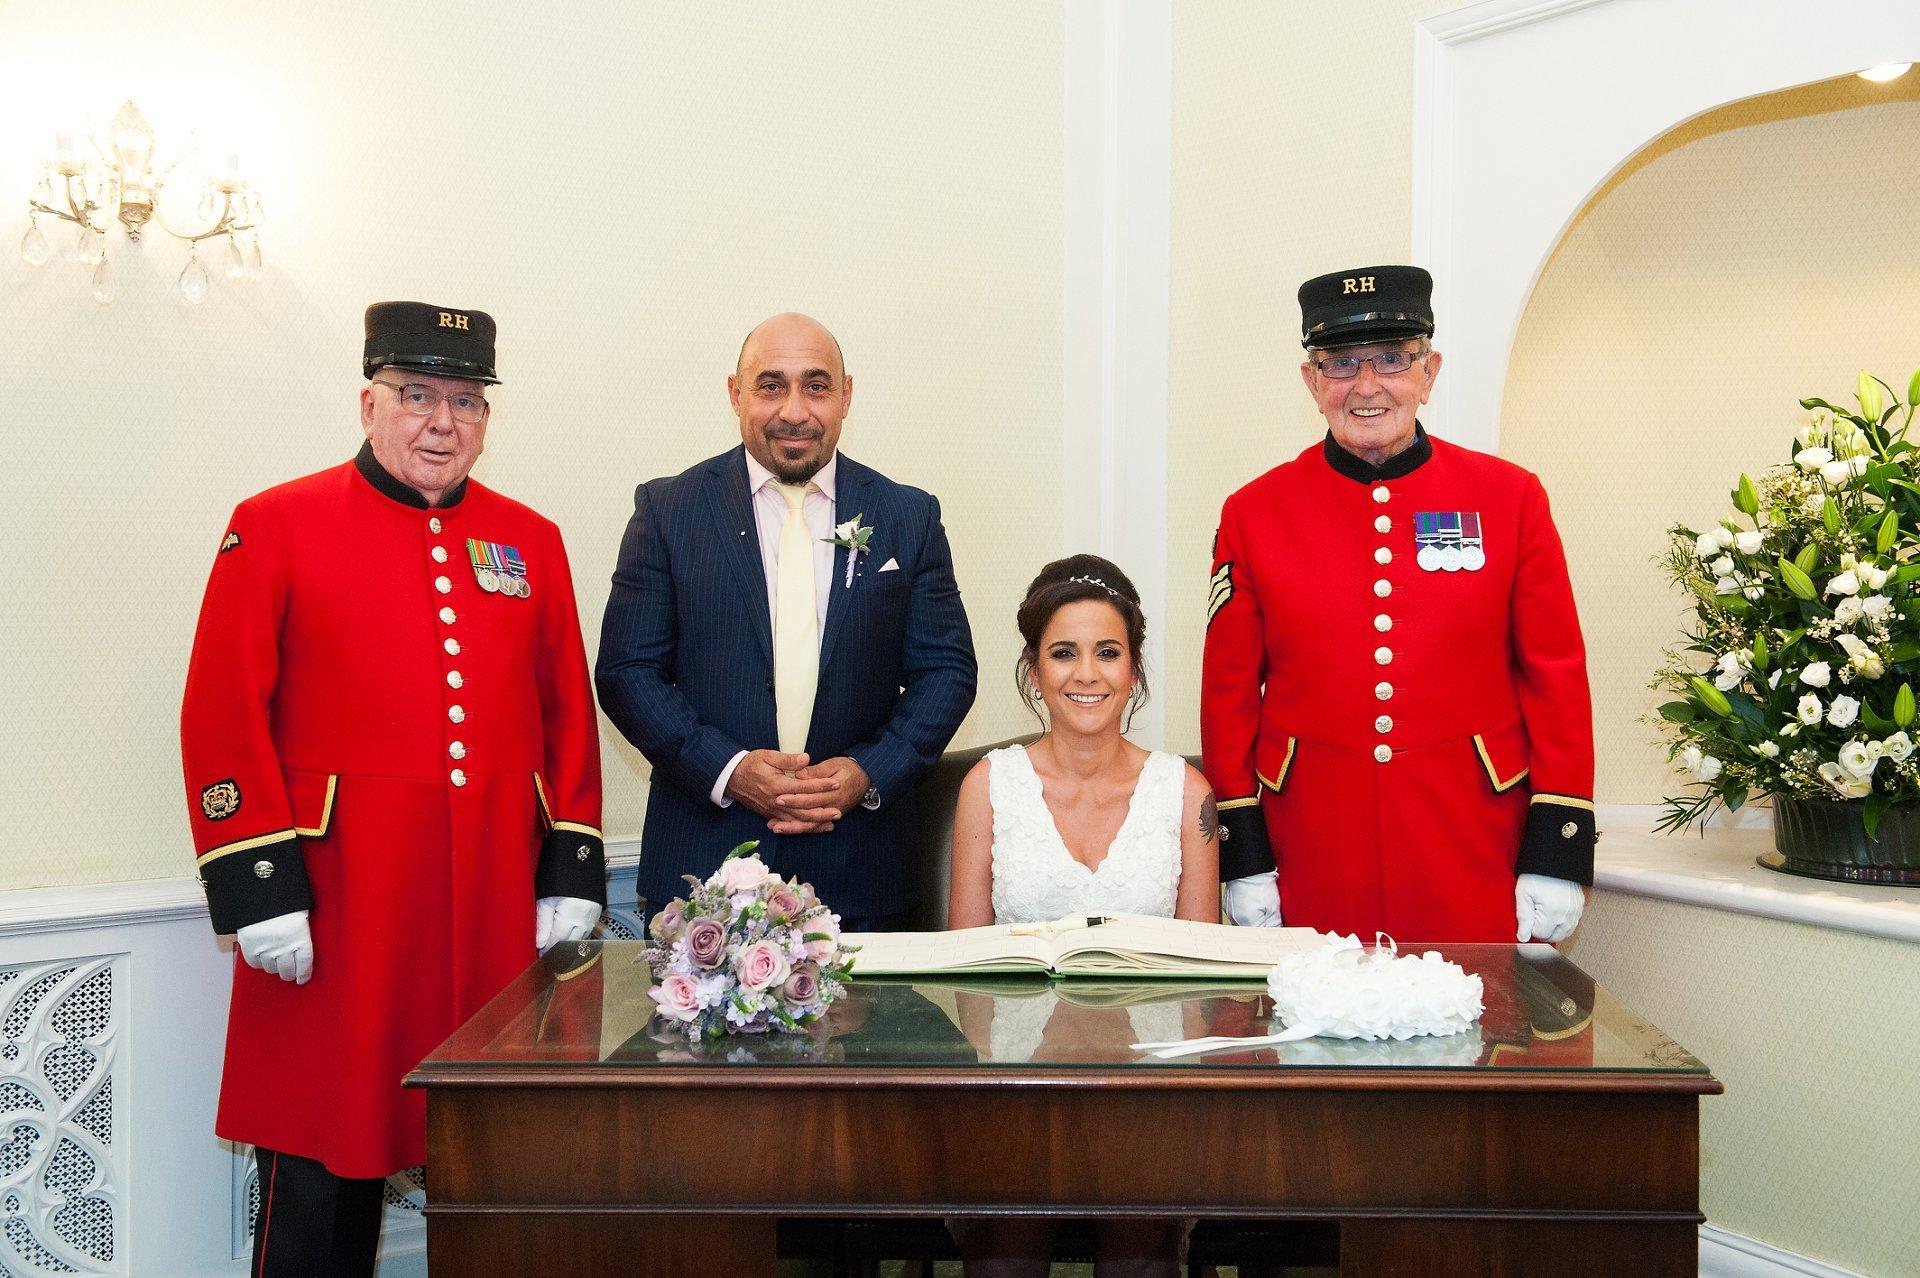 Bride & groom and Chelsea Pensioner witnessess at Kensington & Chelsea Register Office civil ceremony